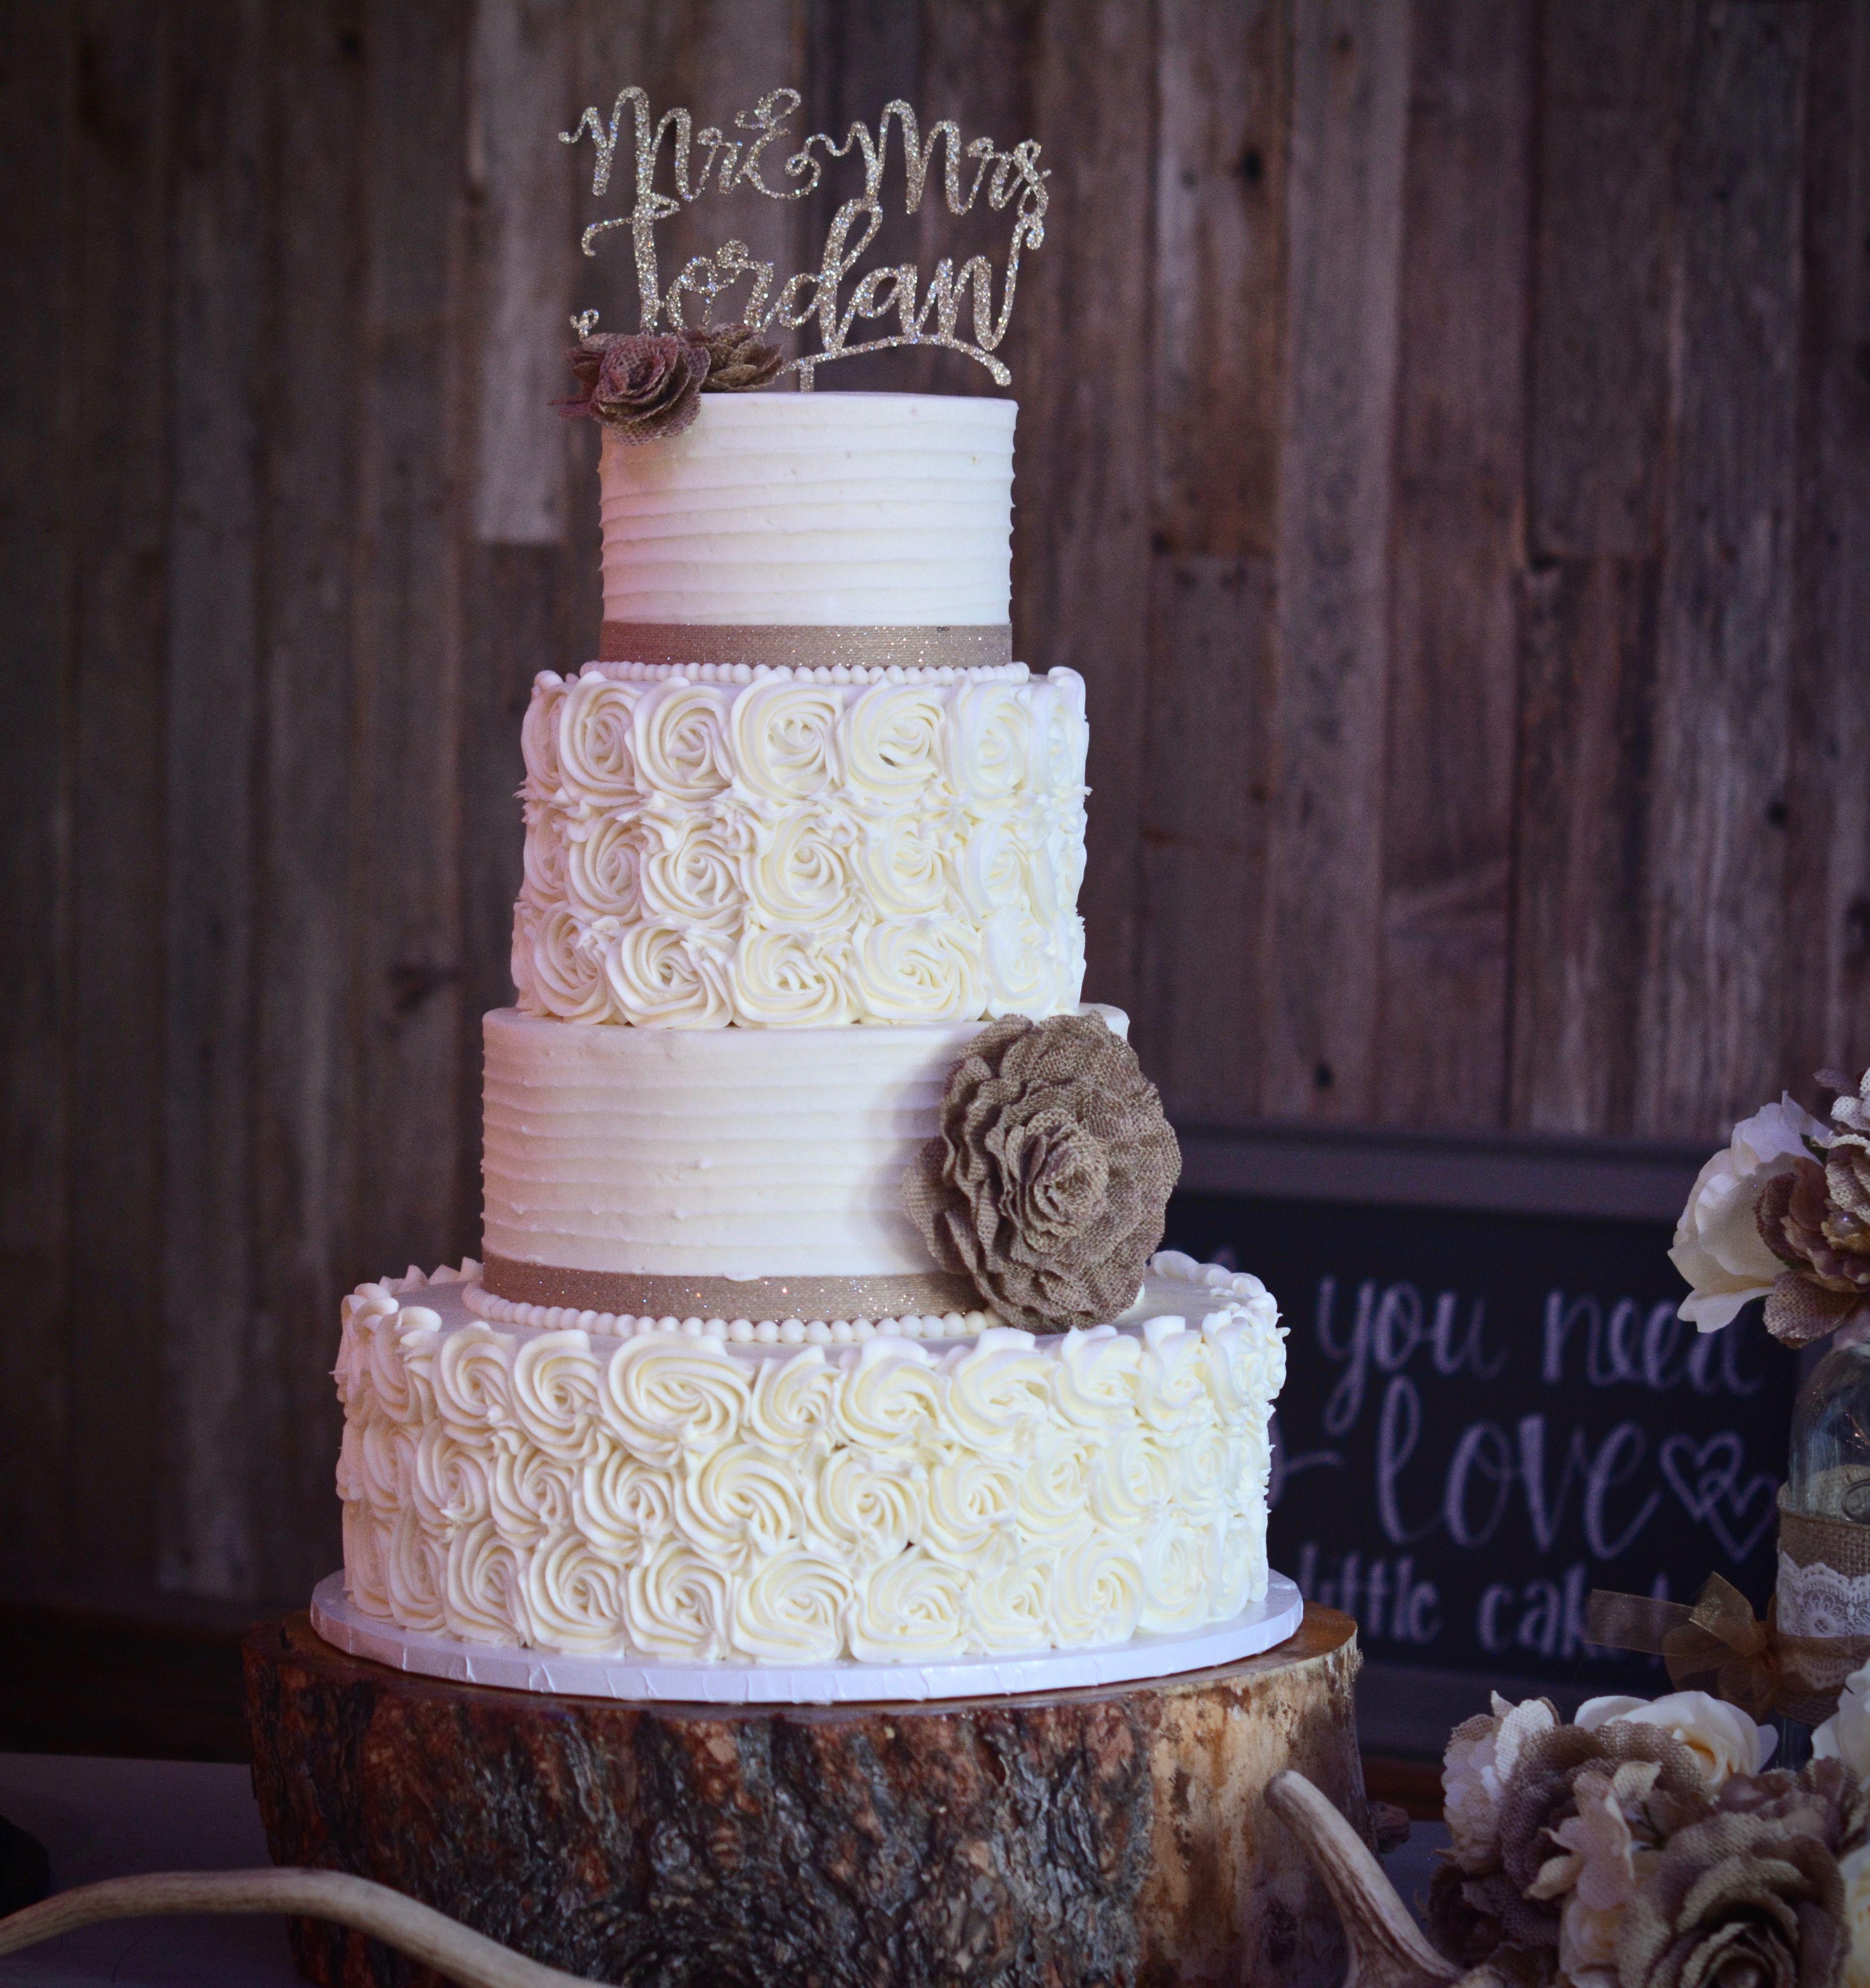 Wedding Cakes San Antonio  Malinalli Wedding Cakes & Dessert Tables San Antonio TX